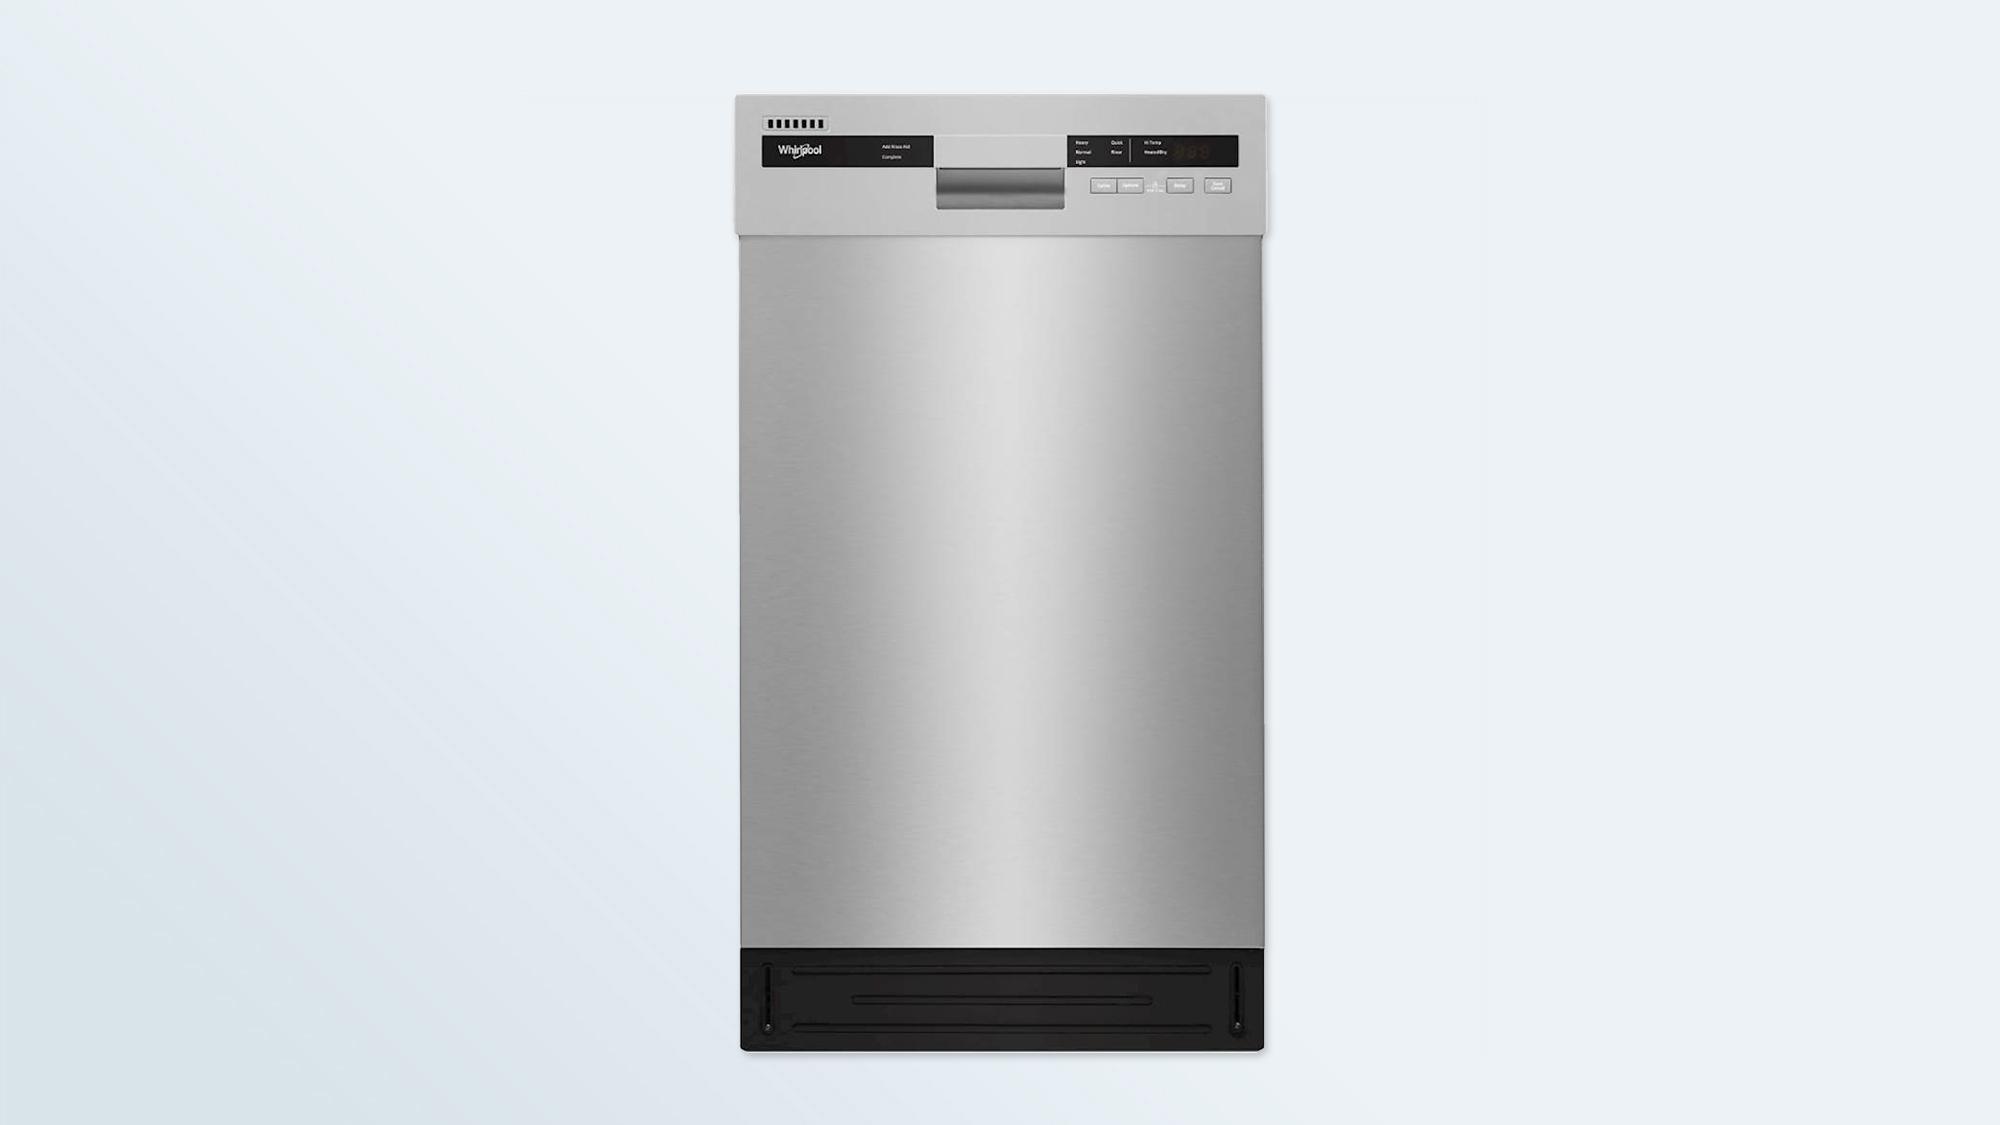 Best dishwashers: Whirlpool WDF518SAHM